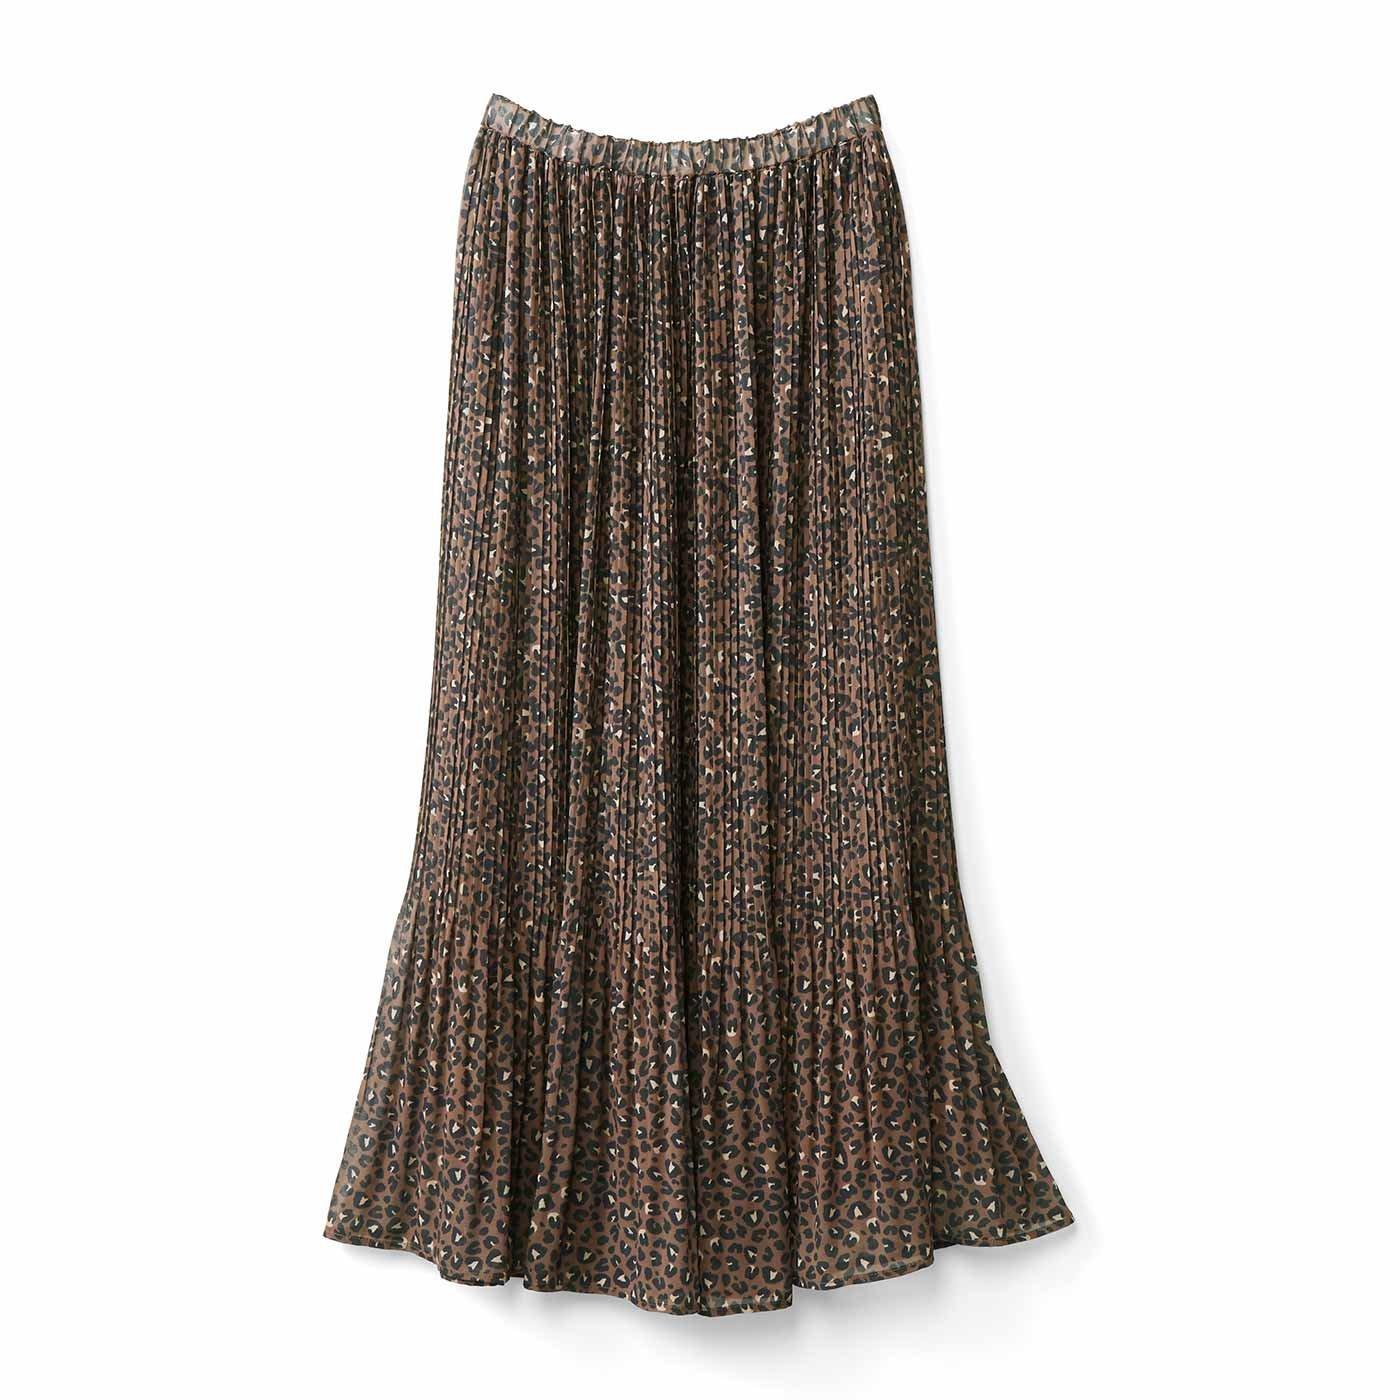 IEDIT[イディット] アニマルプリントの消しプリーツスカート〈ブラウンレオパード〉